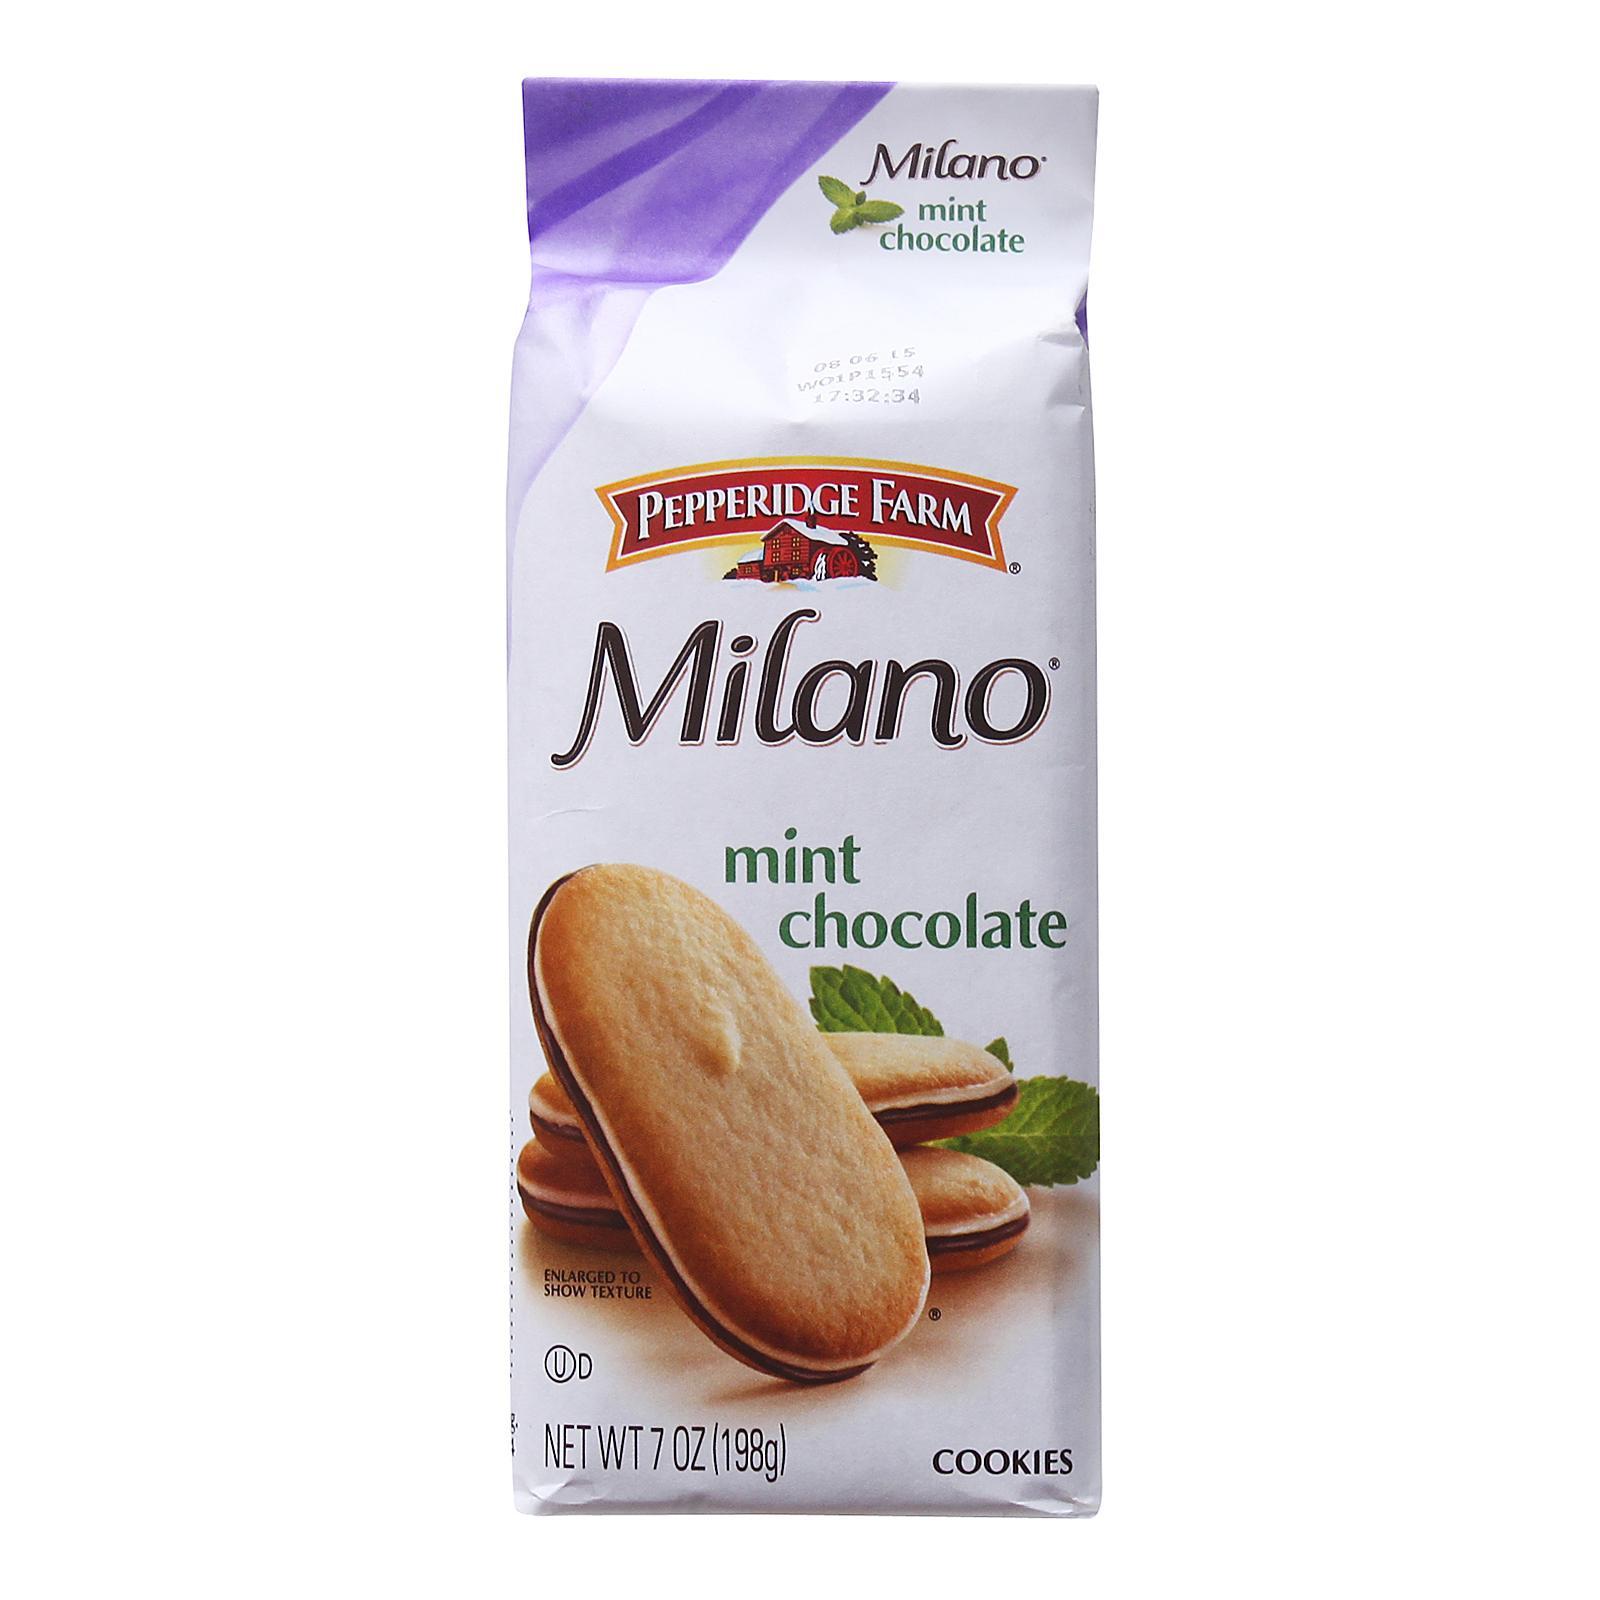 Pepperidge Farm Mint Chocolate Milano Distinctive Cookies